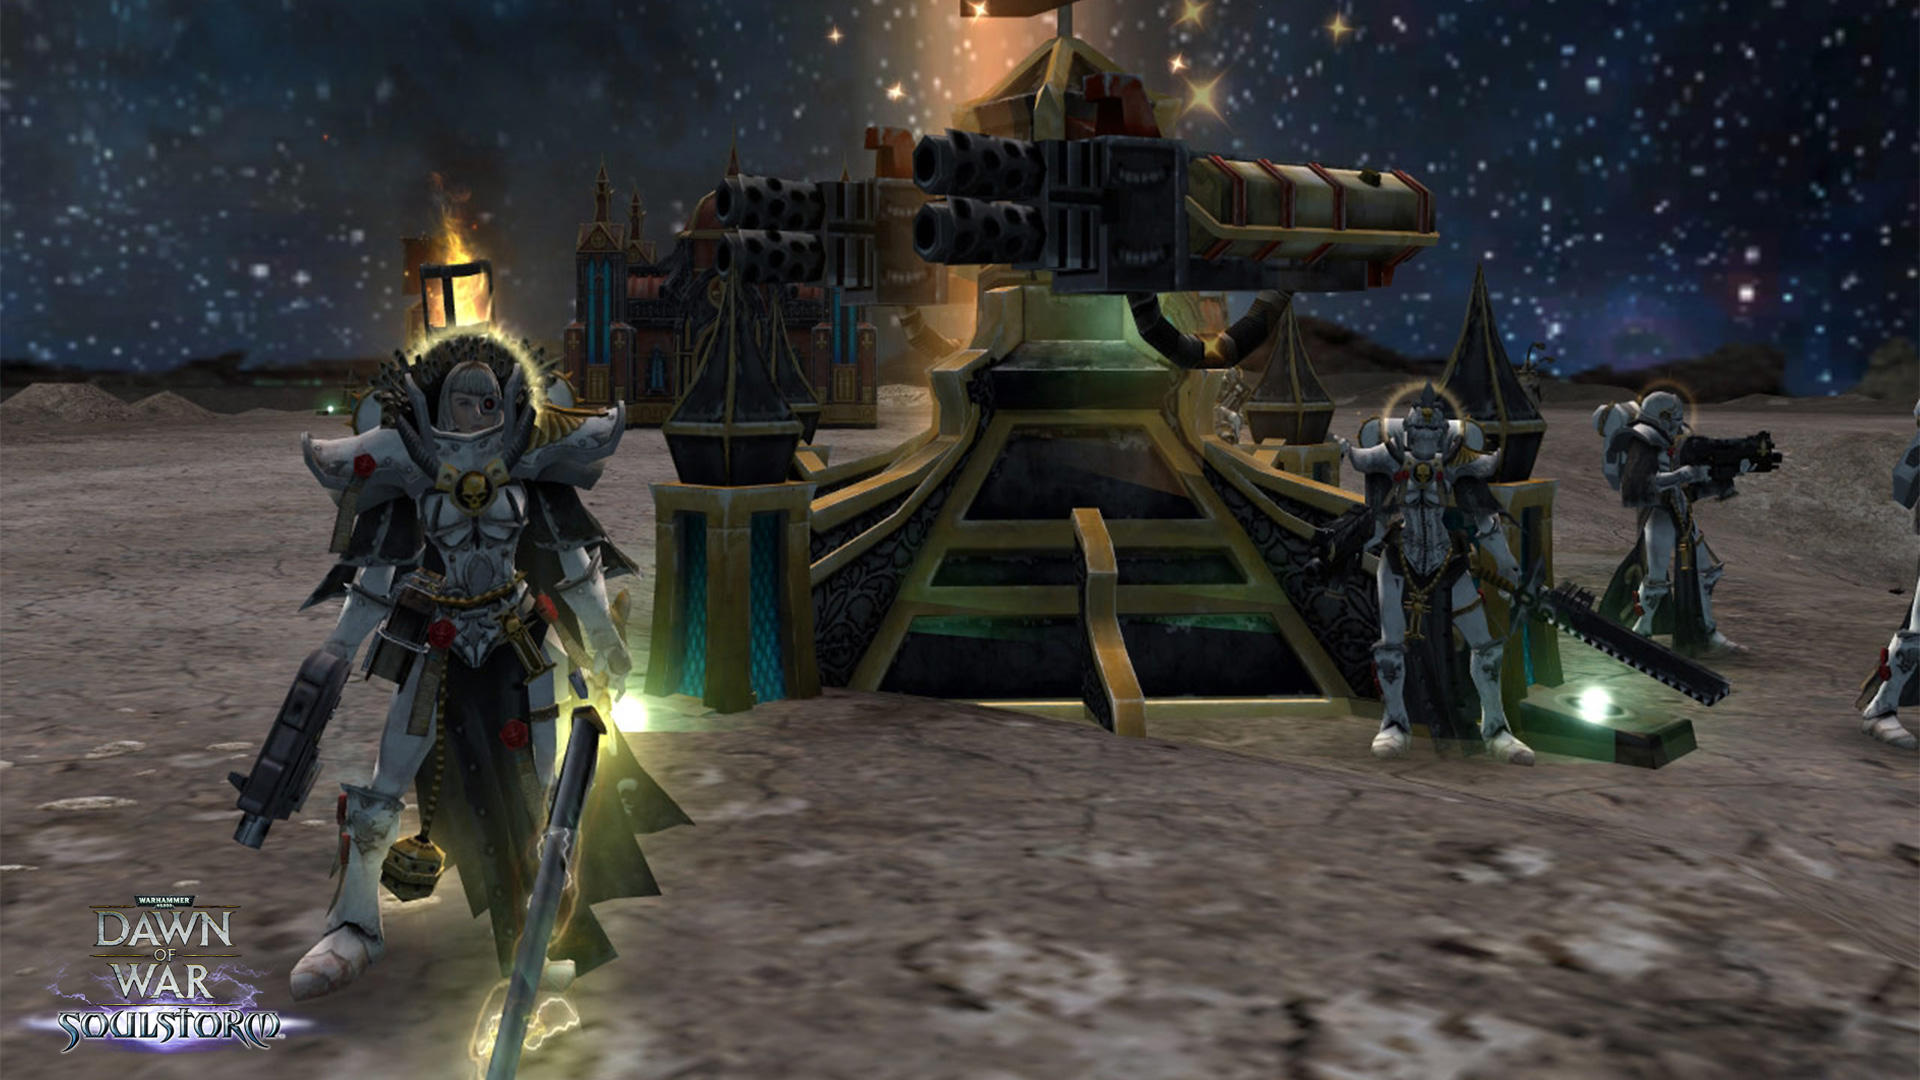 dawn of war soulstorm free download